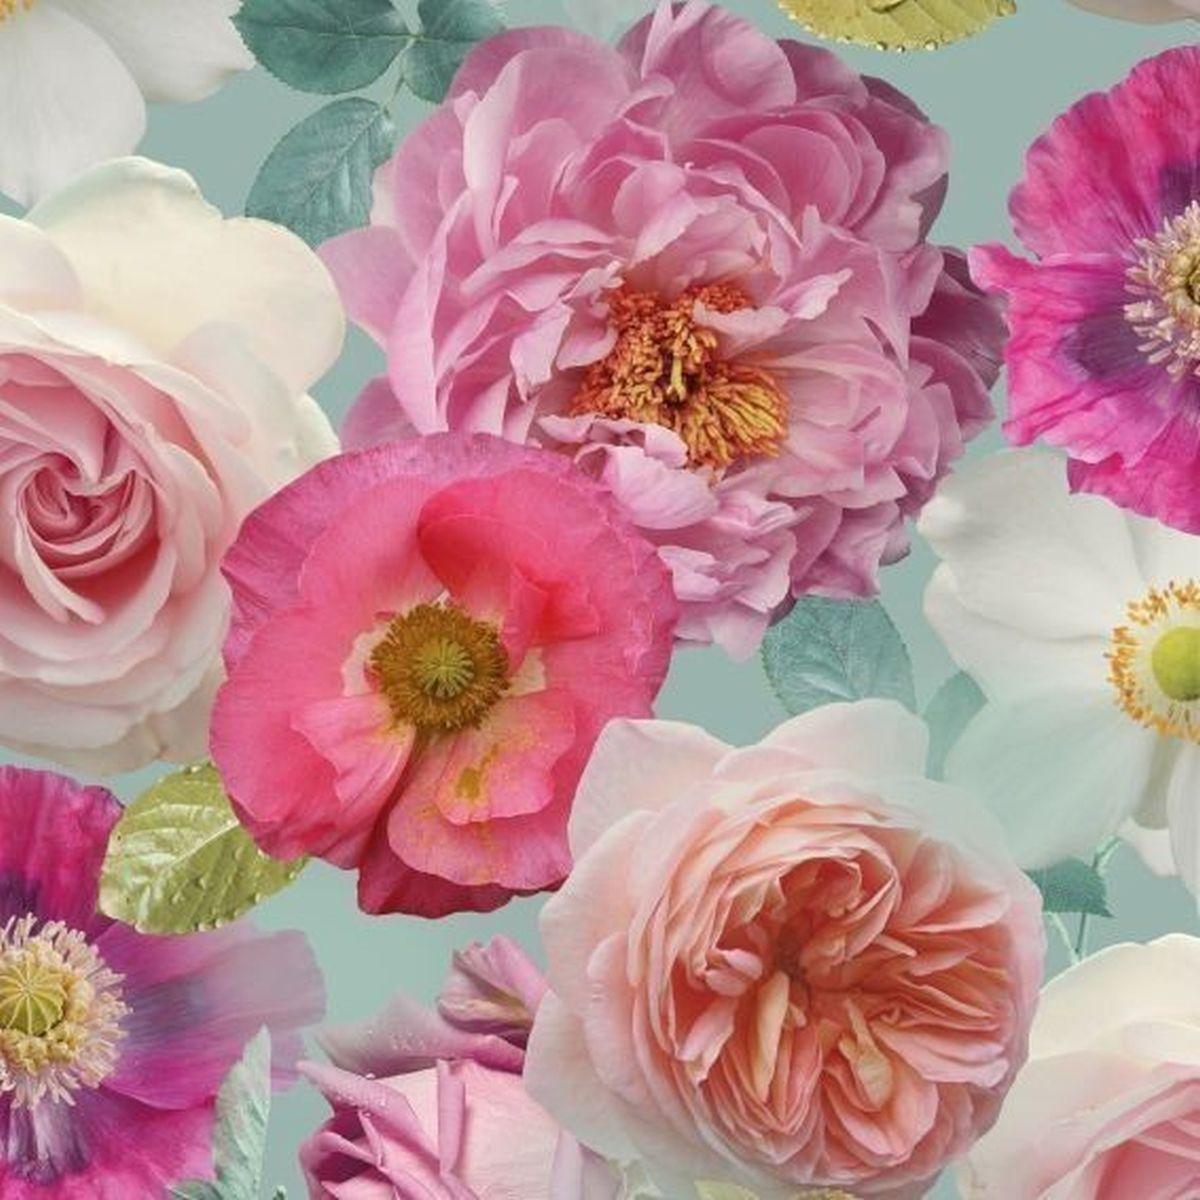 Best of Arthouse Vliestapete Erstklassige Wandbekleidung 259600 Rot Blumentapete